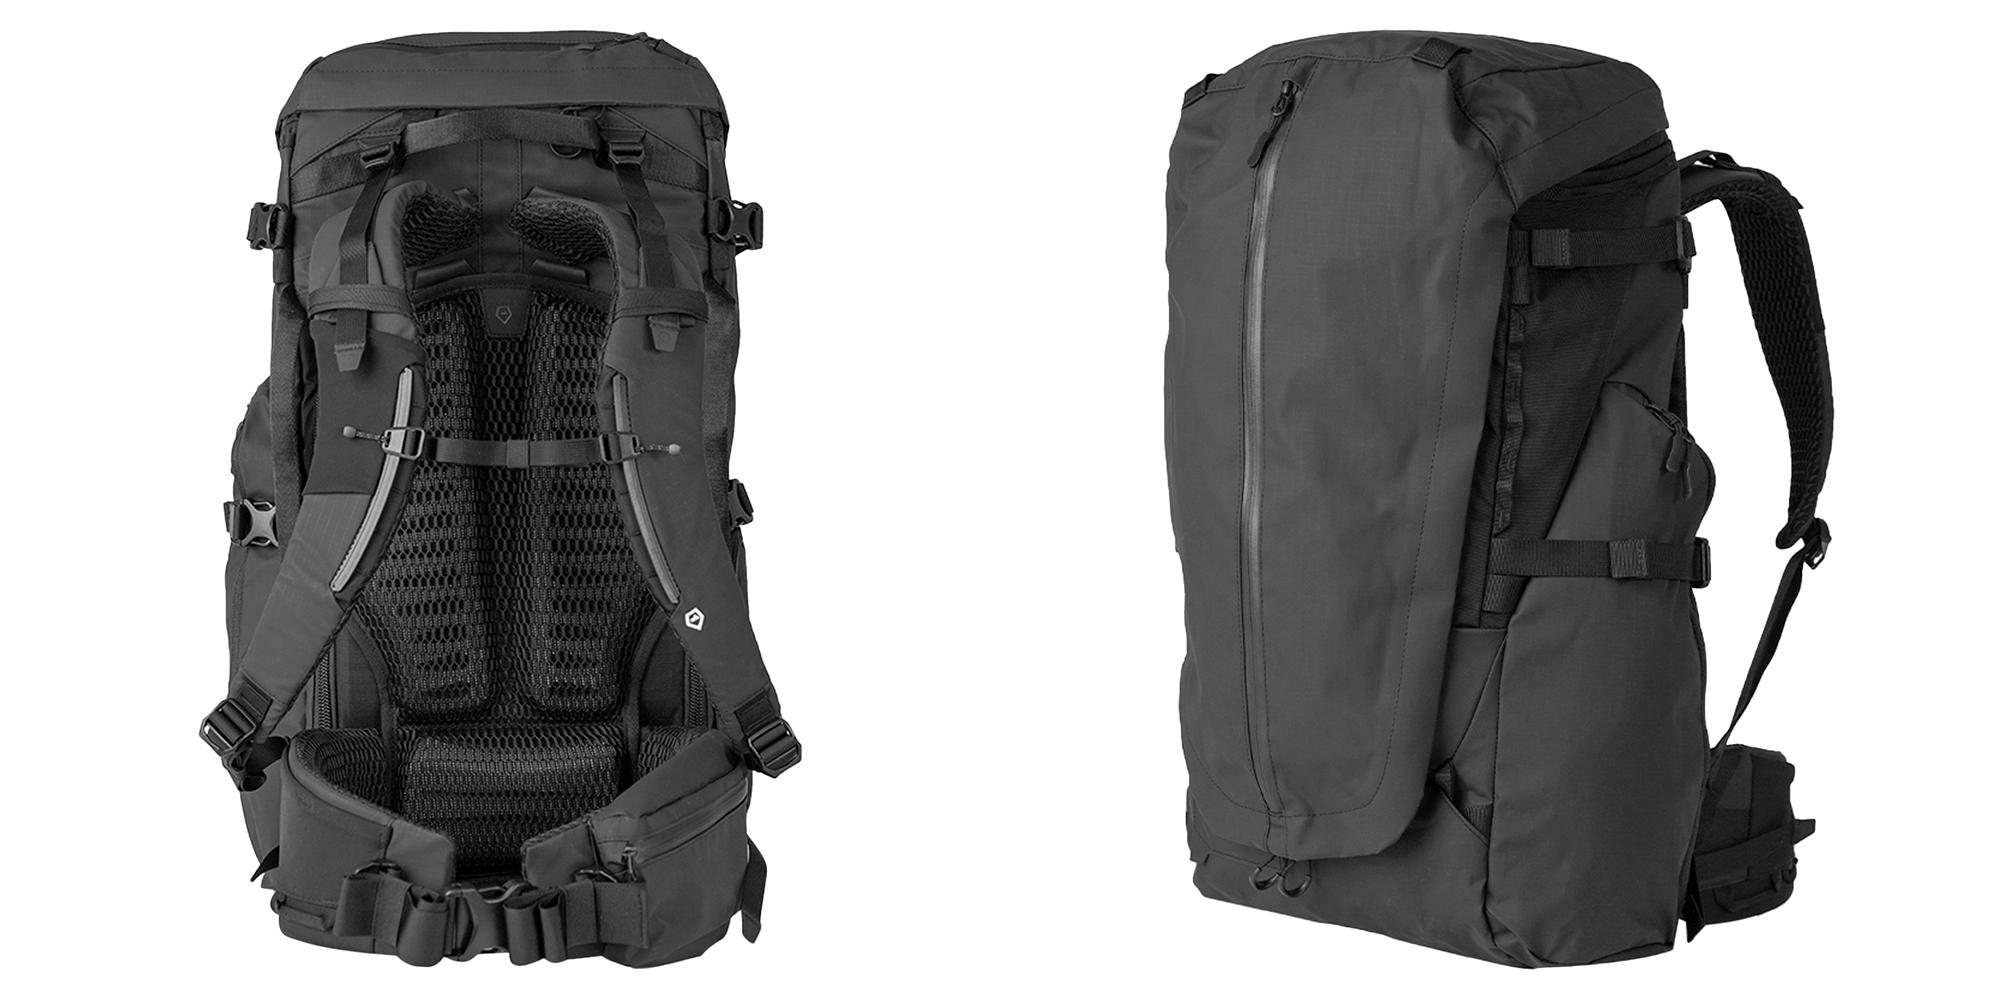 Wandrd Fernweh Trekking Backpack - Comfort and convenience